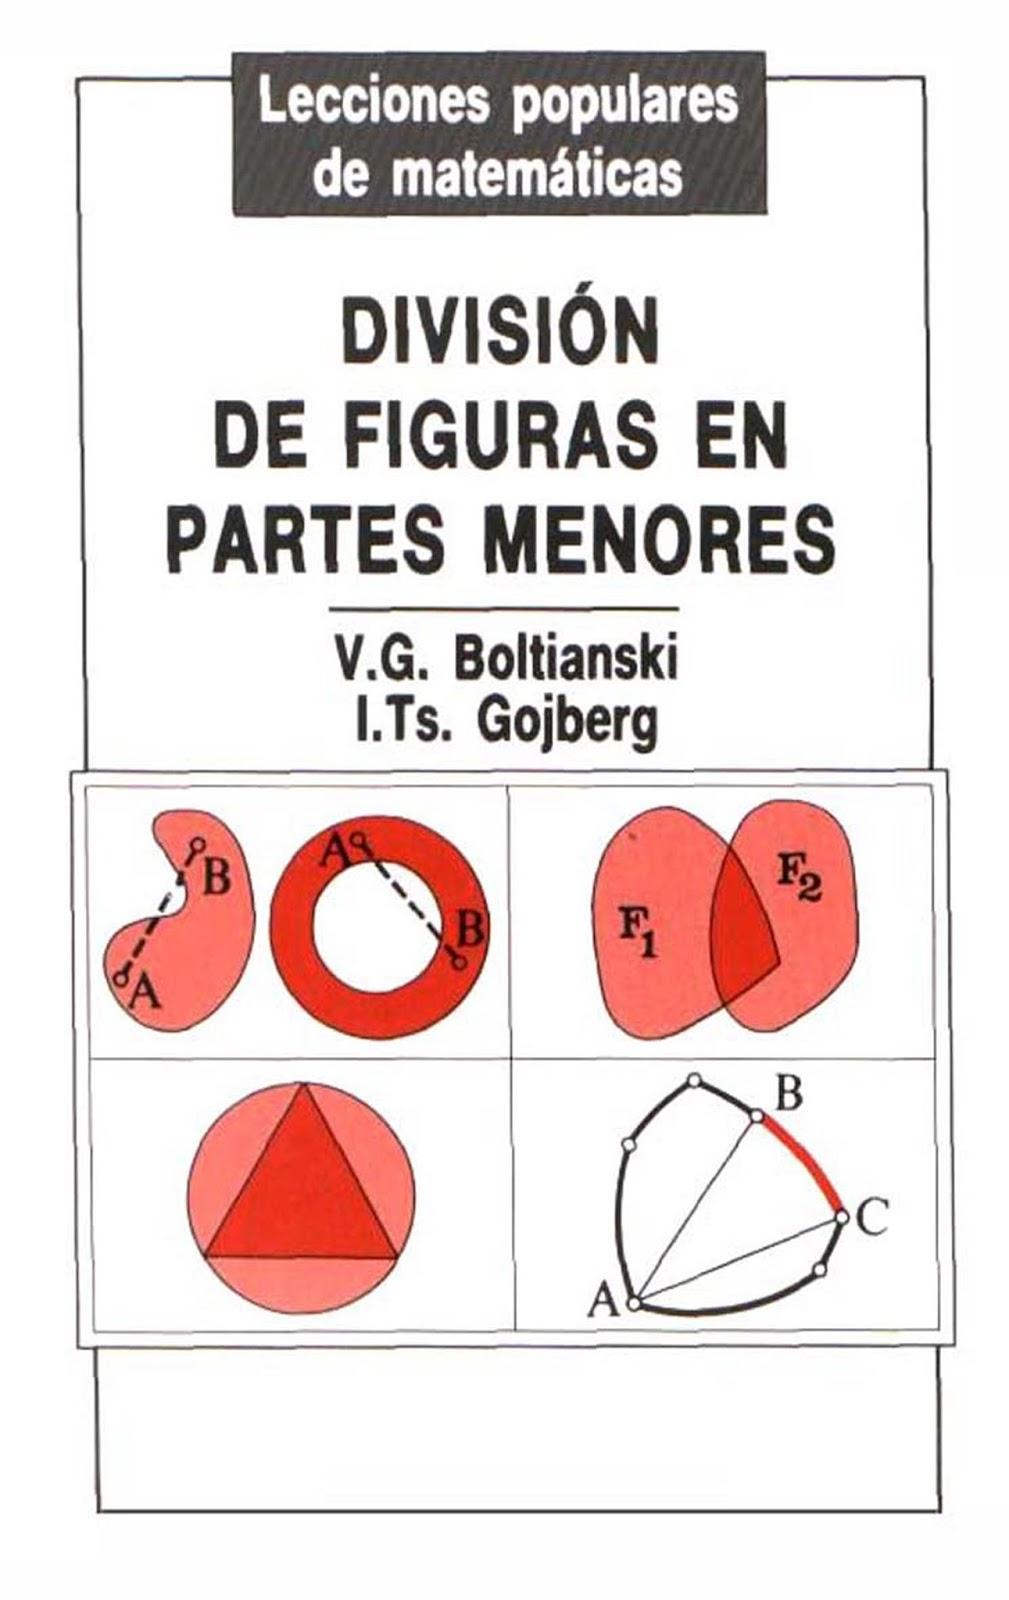 División de figuras en partes menores – V. G. Boltianski